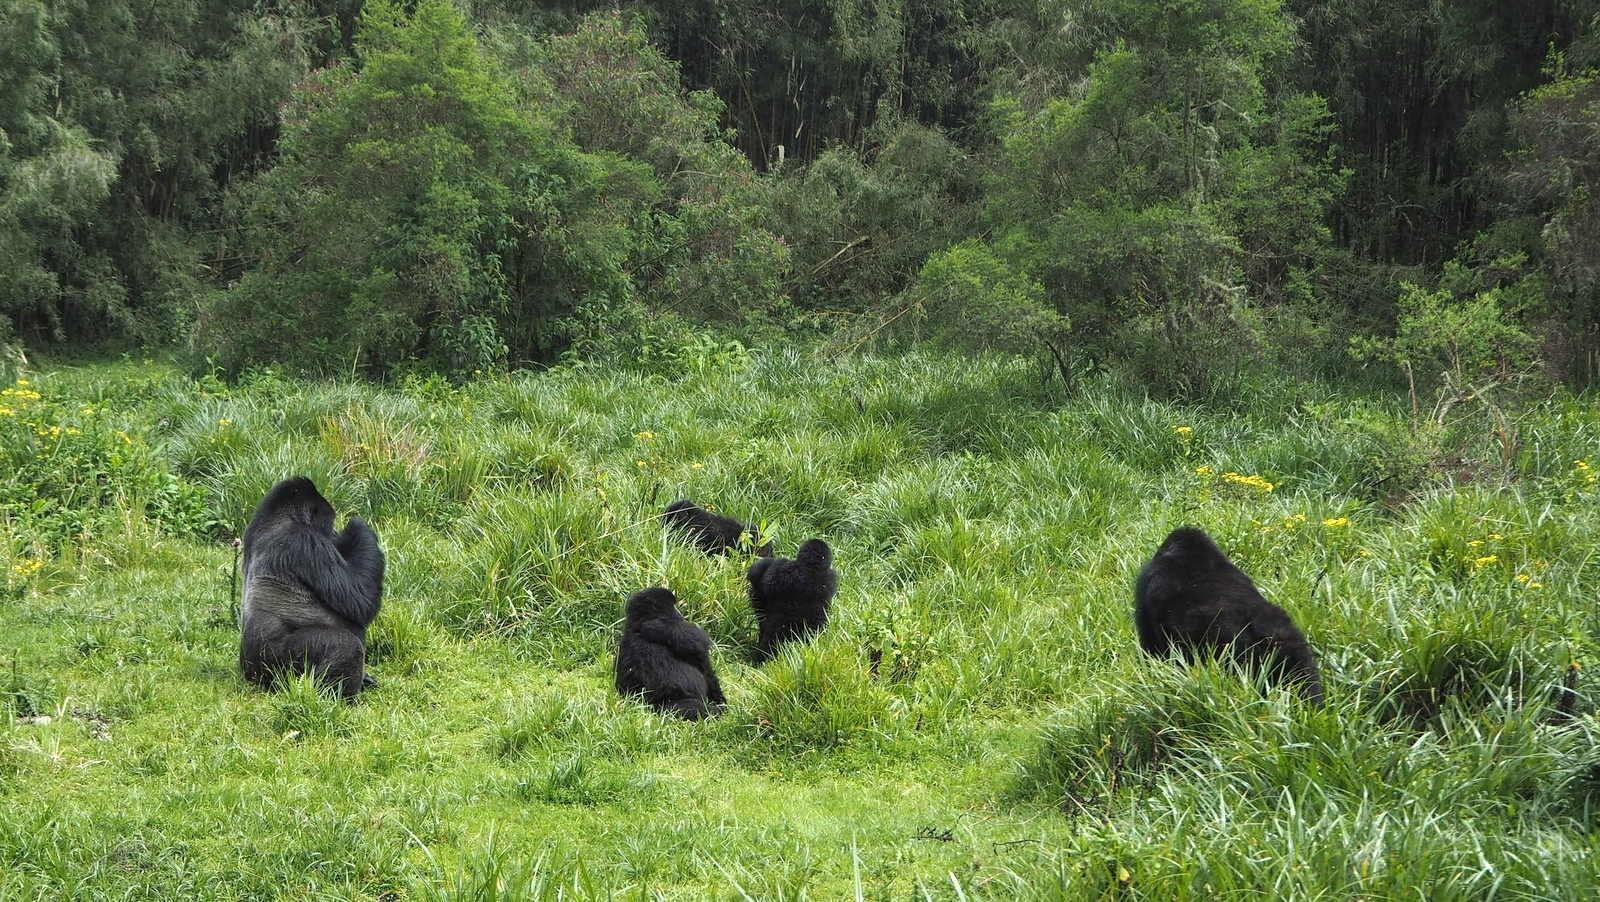 Rwanda mountain gorillas - first encounter